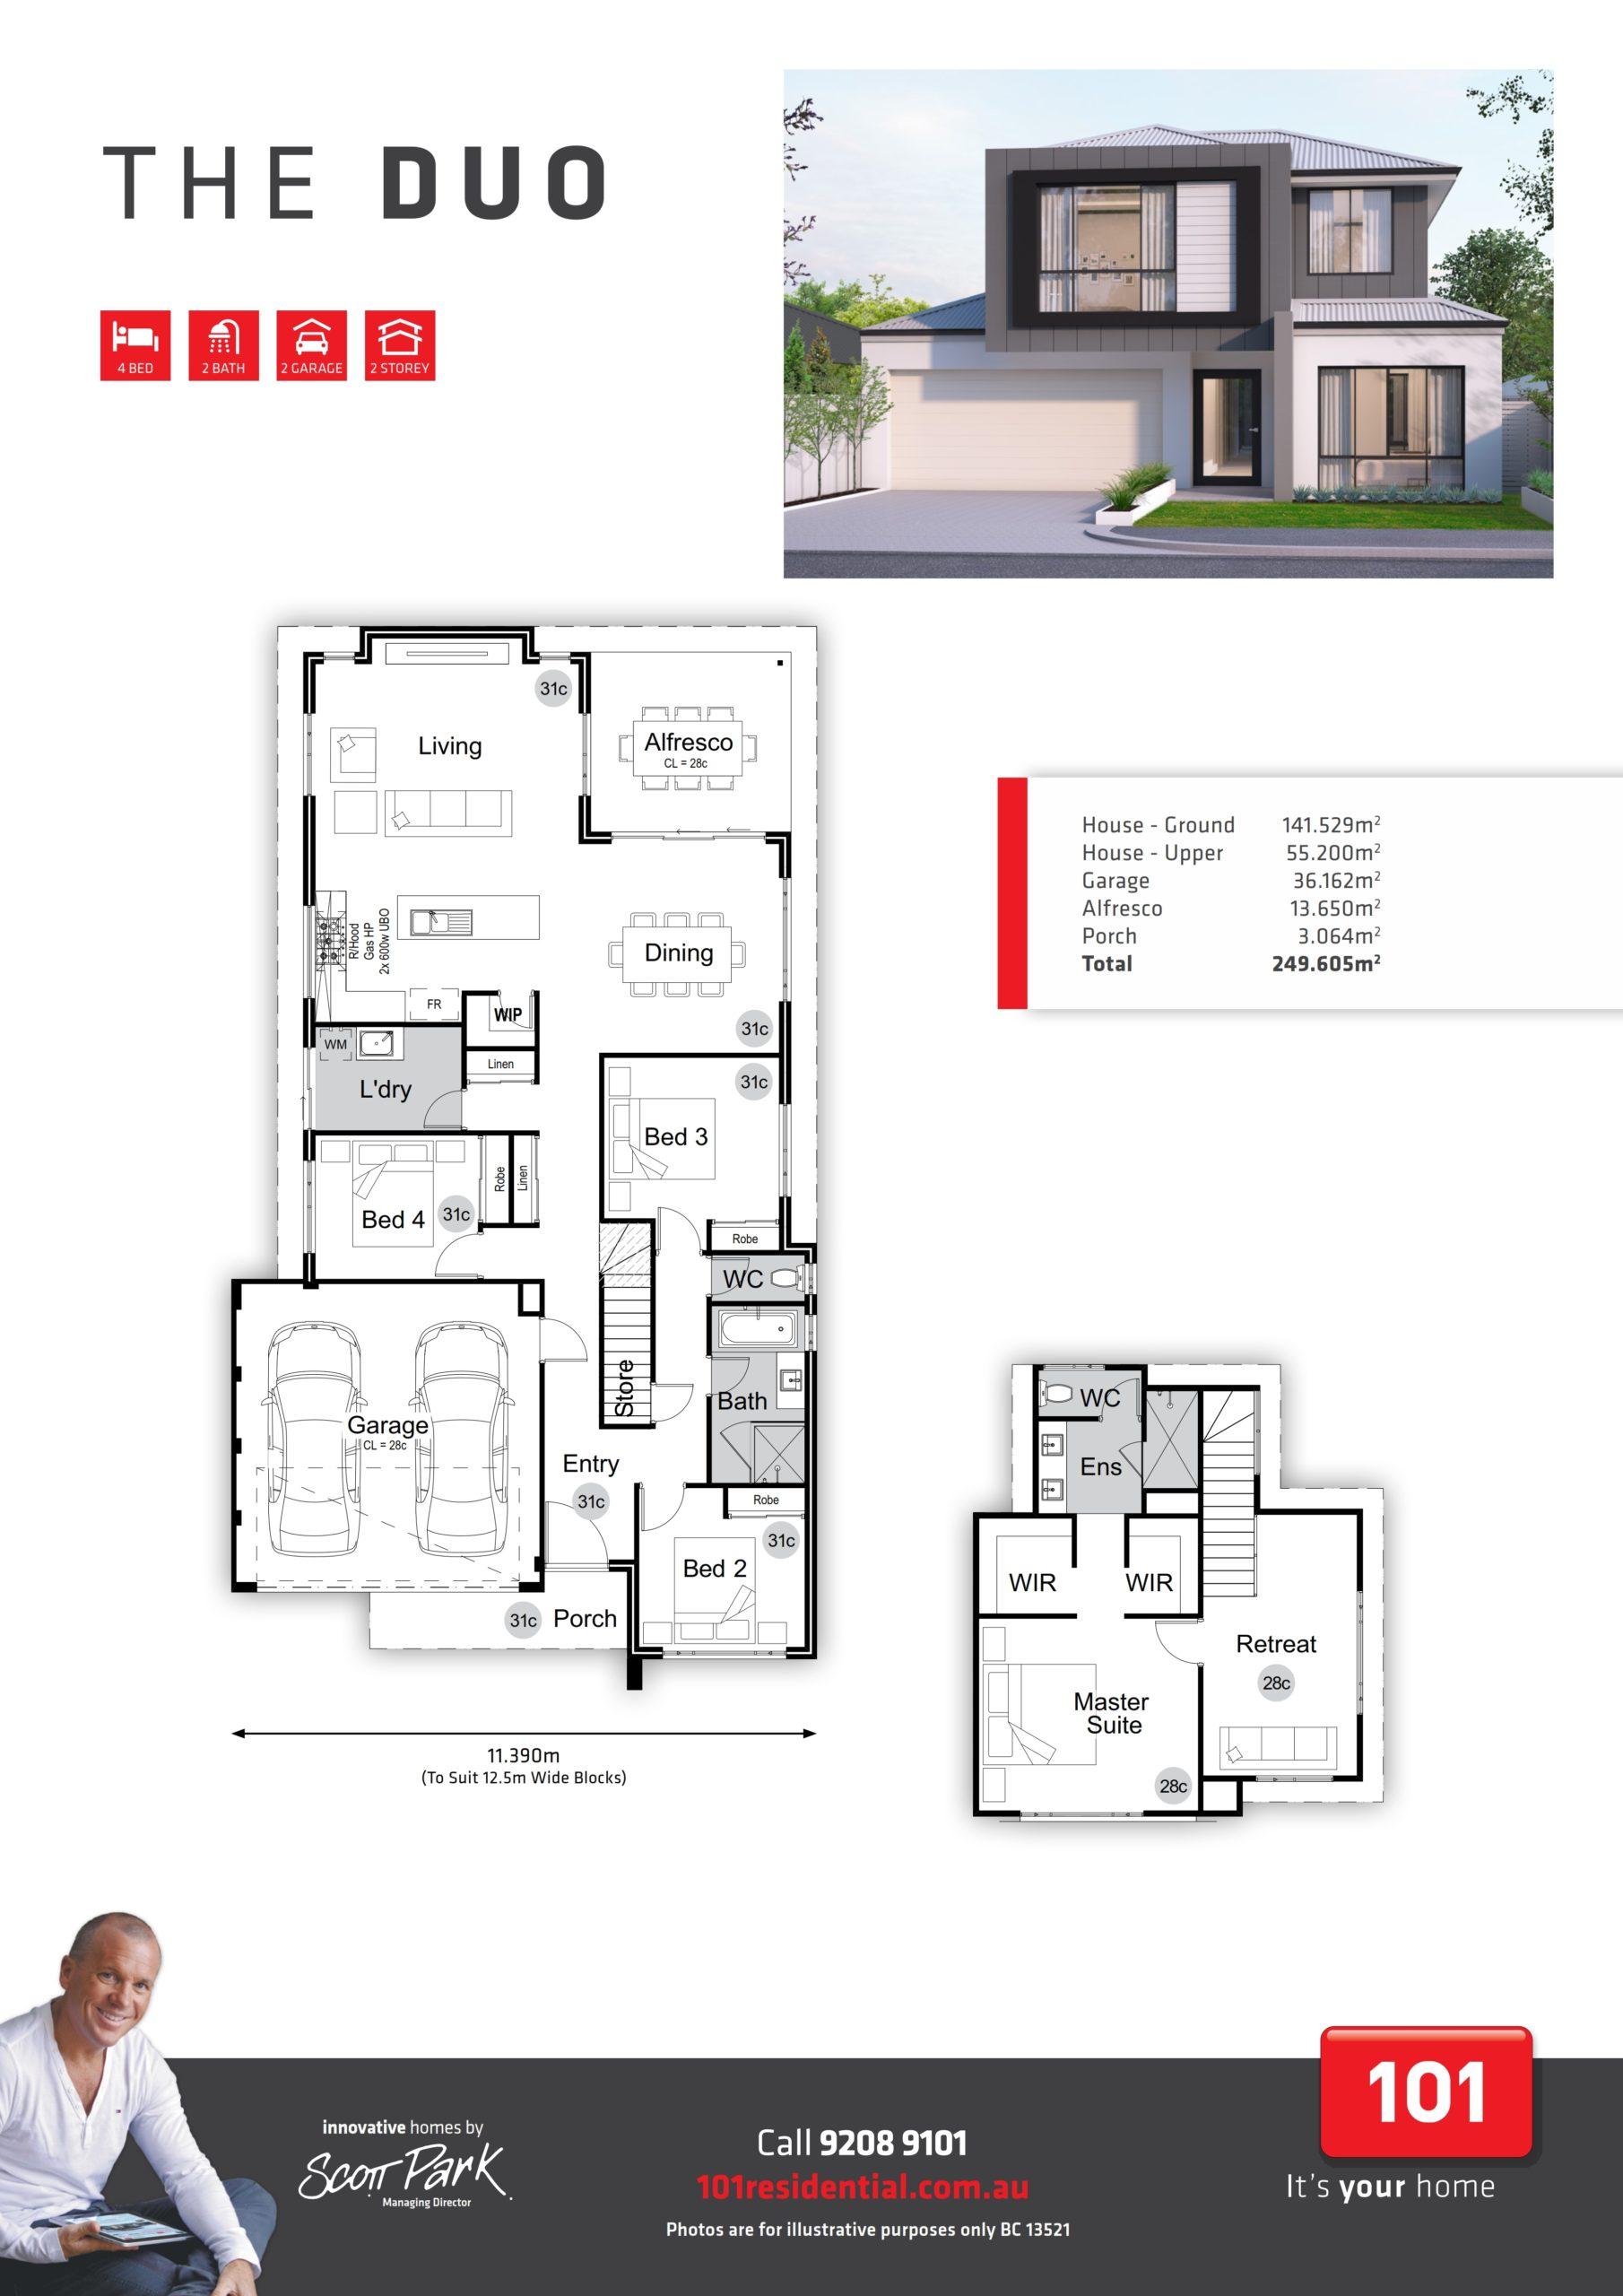 101 A3 Floor Plan - Duo WEB_001